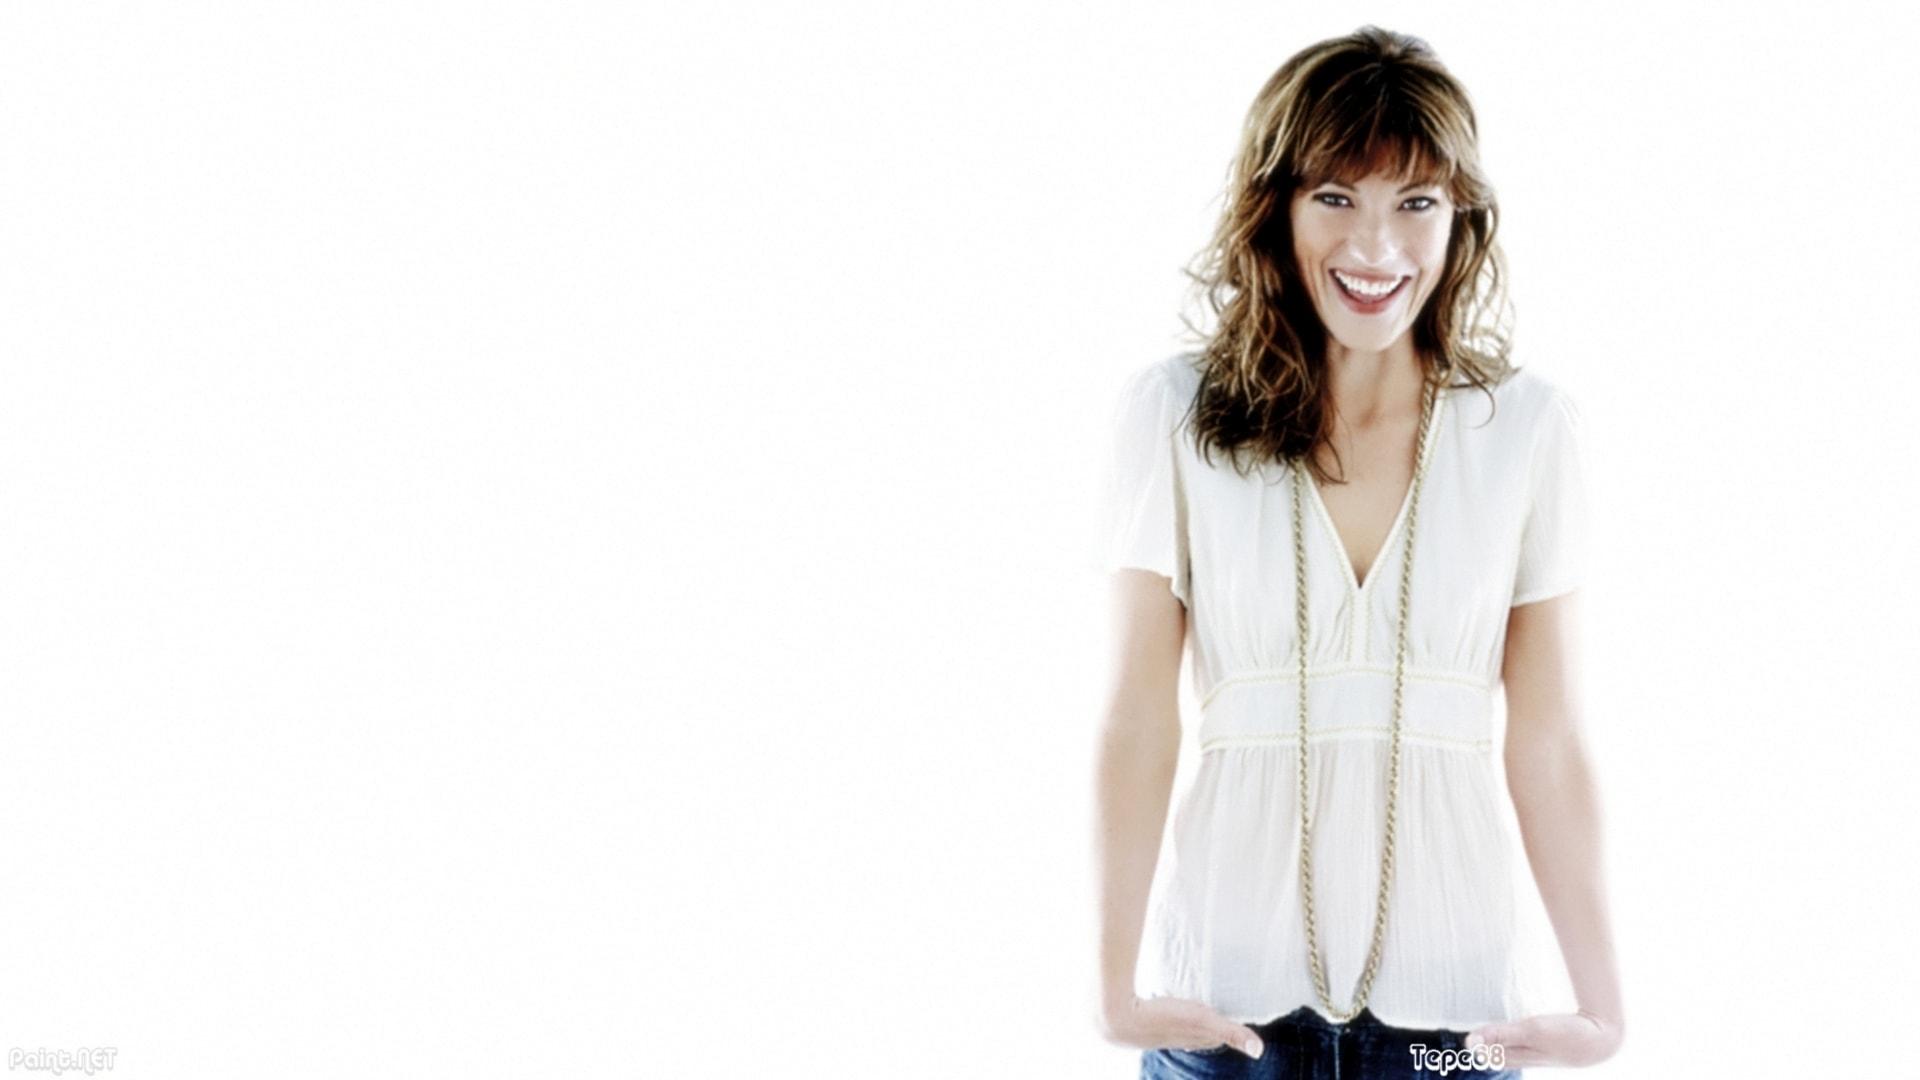 Jennifer Carpenter Backgrounds